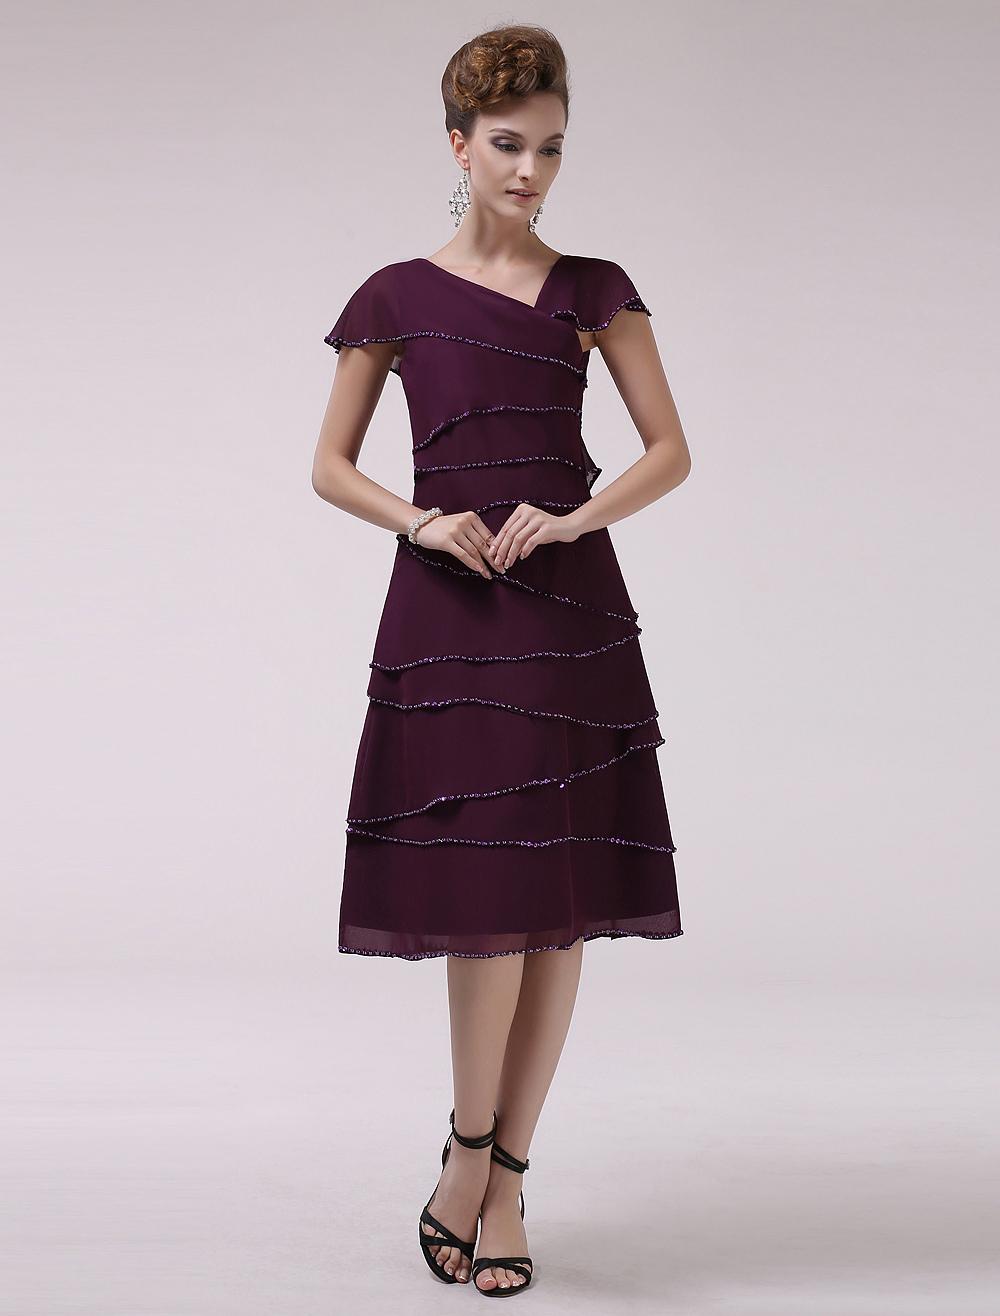 Grape A-line V-Neck Tiered Short Sleeves Chiffon Bridal Mother Dress Wedding Guest Dress photo